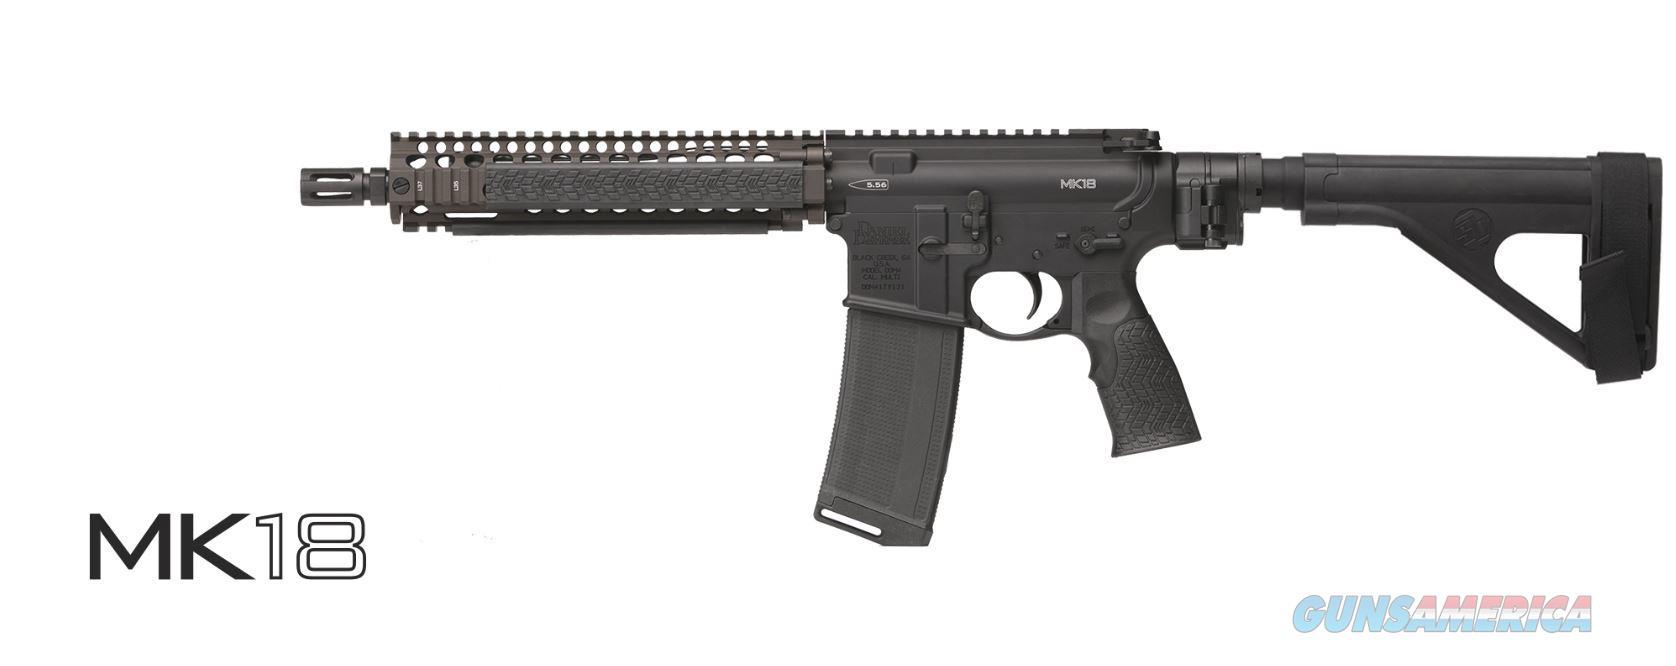 Daniel Defense Ddm4 Mk18 Pstl 223/5.56 02-088-22038  Guns > Pistols > D Misc Pistols